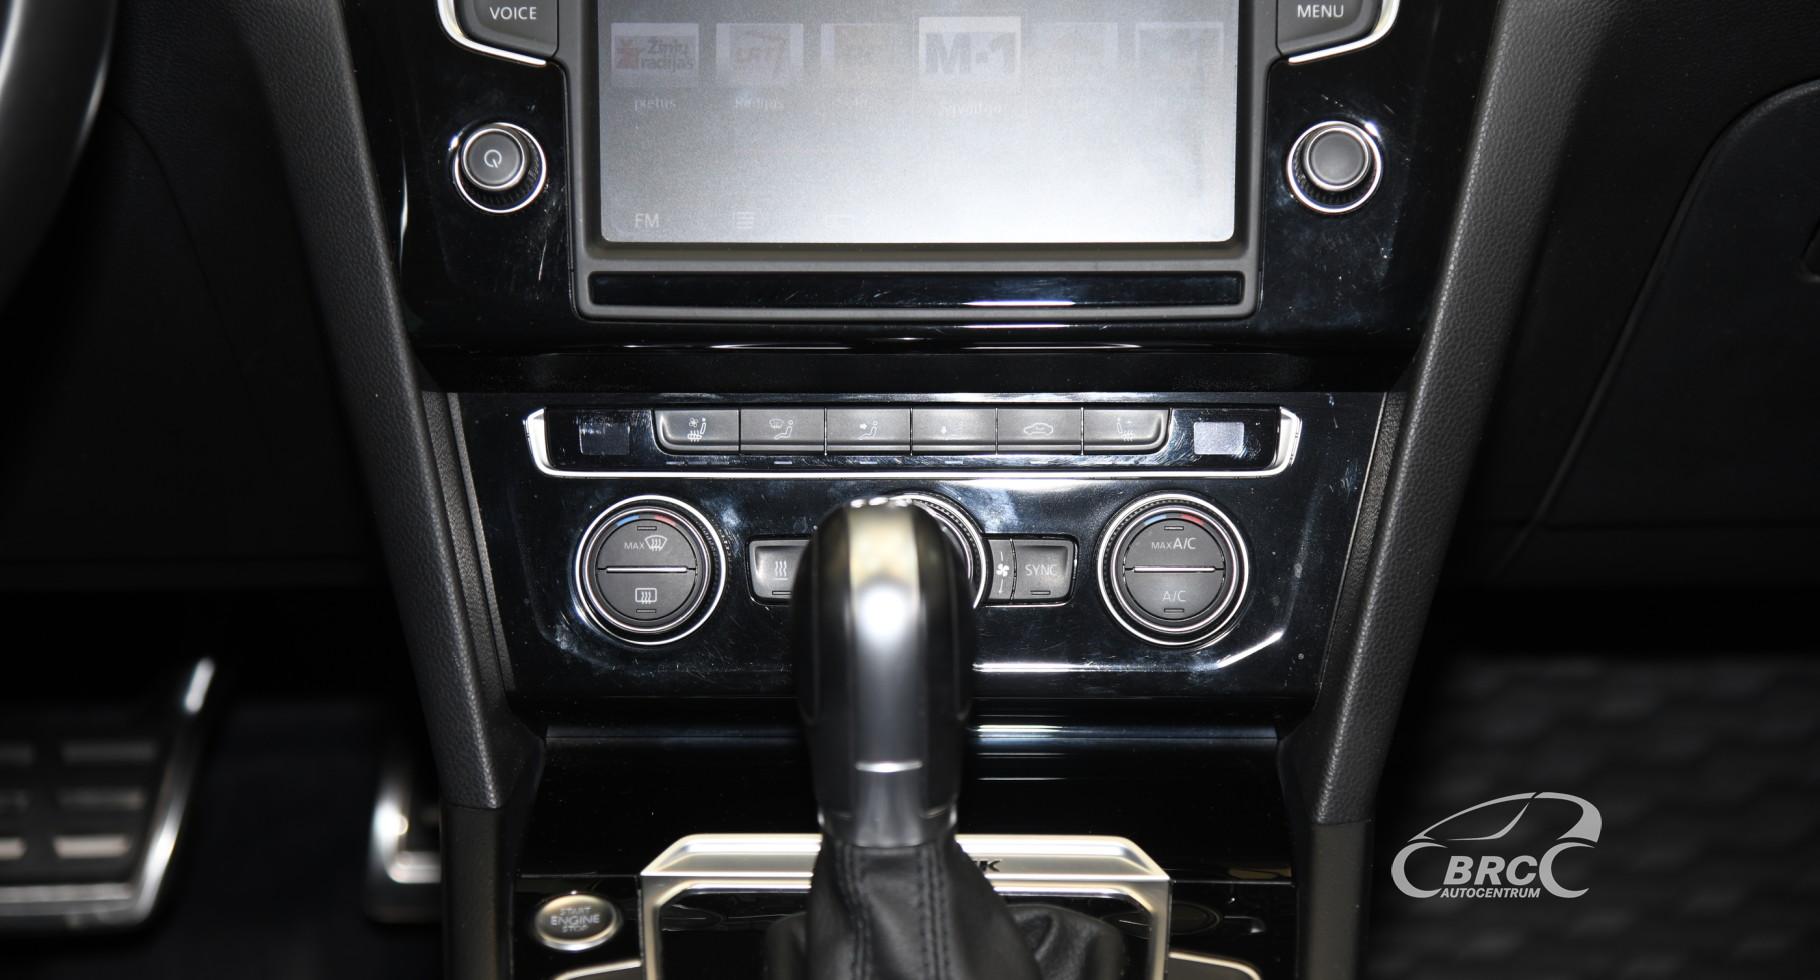 Volkswagen Passat Alltrack 2.0 TDI DSG 4Motion Automatas